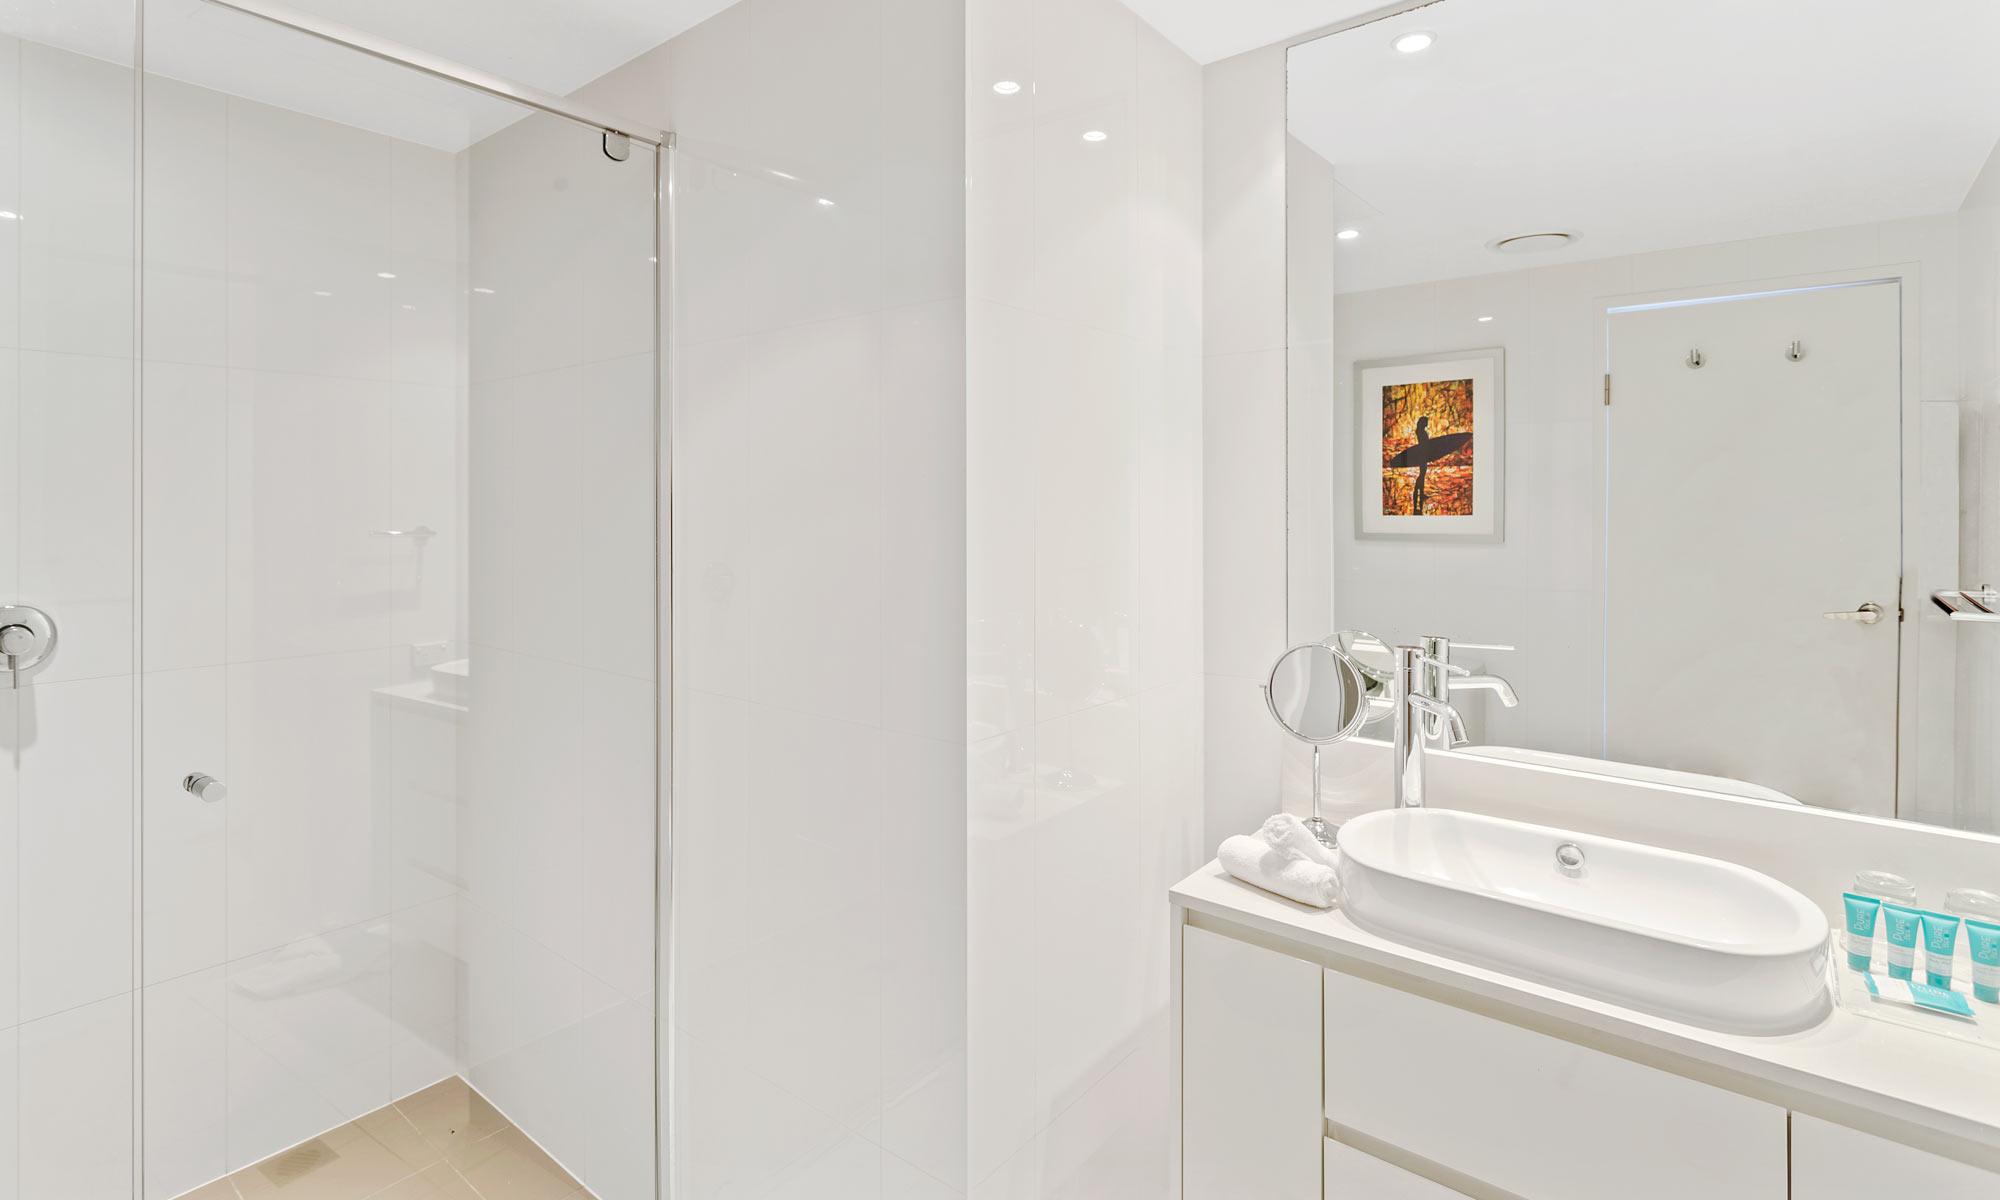 Gold Coast real estate for sale Hilton 22001 in H Residences above Hilton Surfers Paradise ensuite